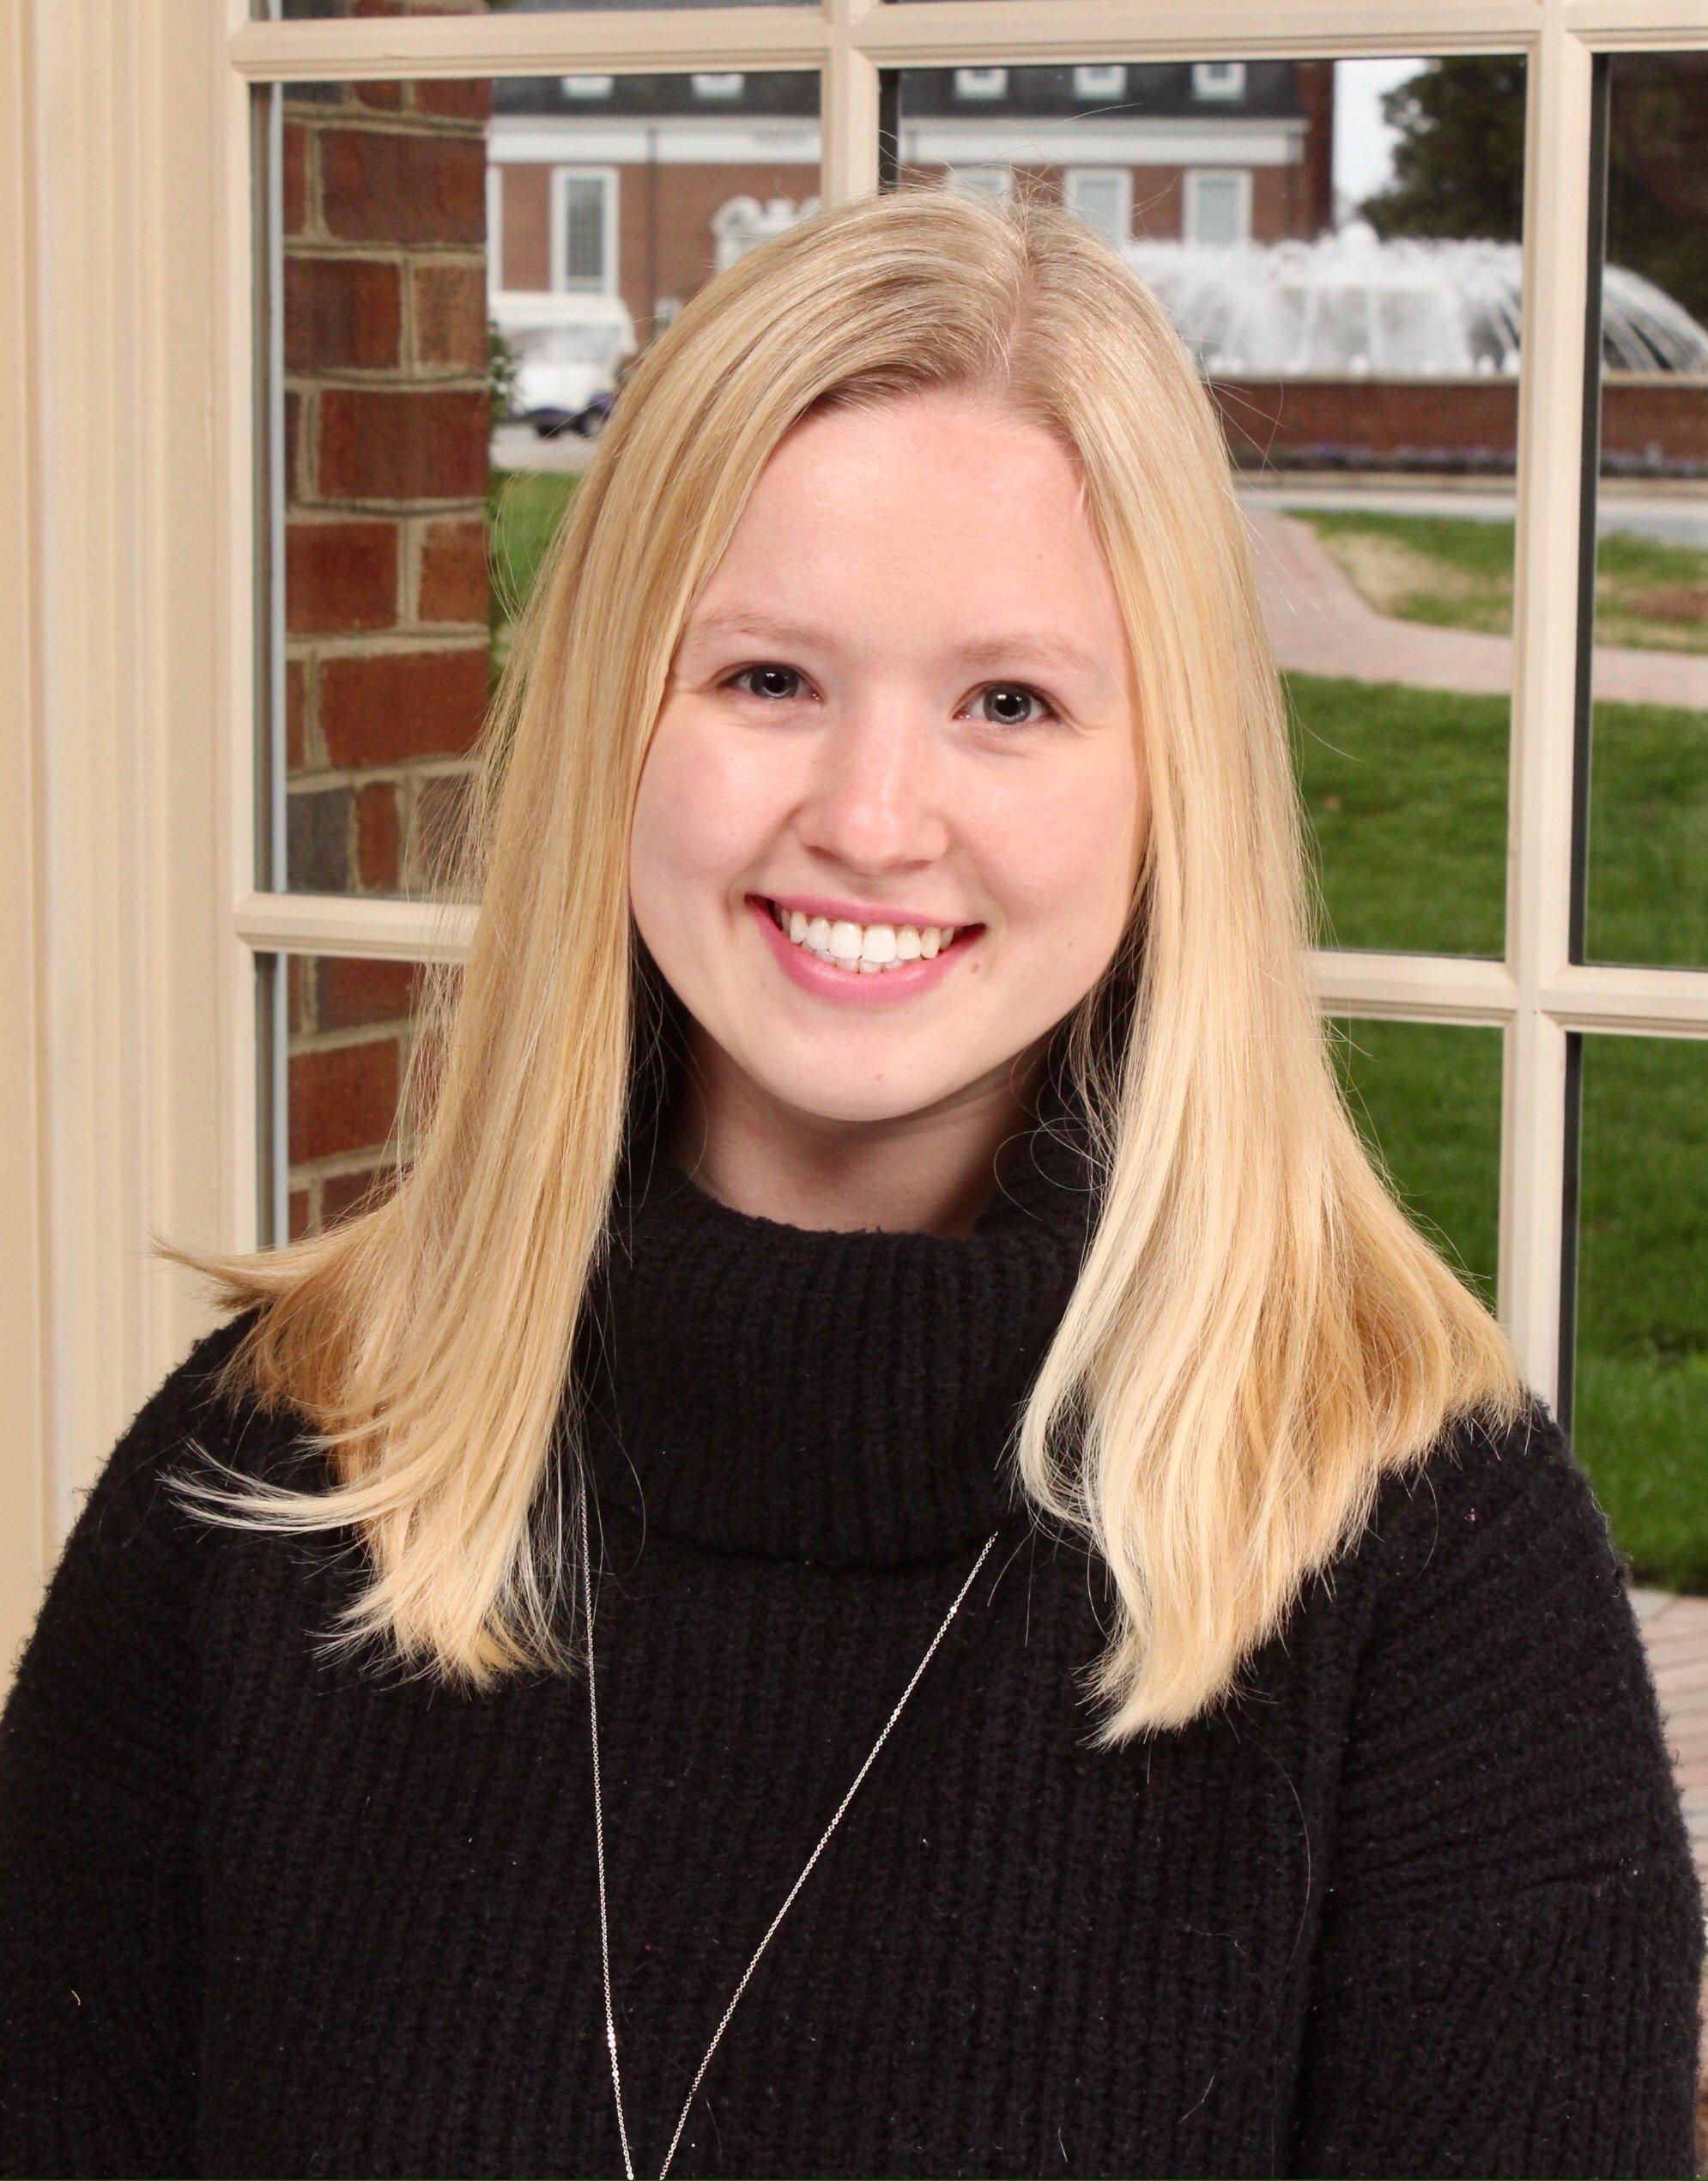 Chloe Hasden High Point University